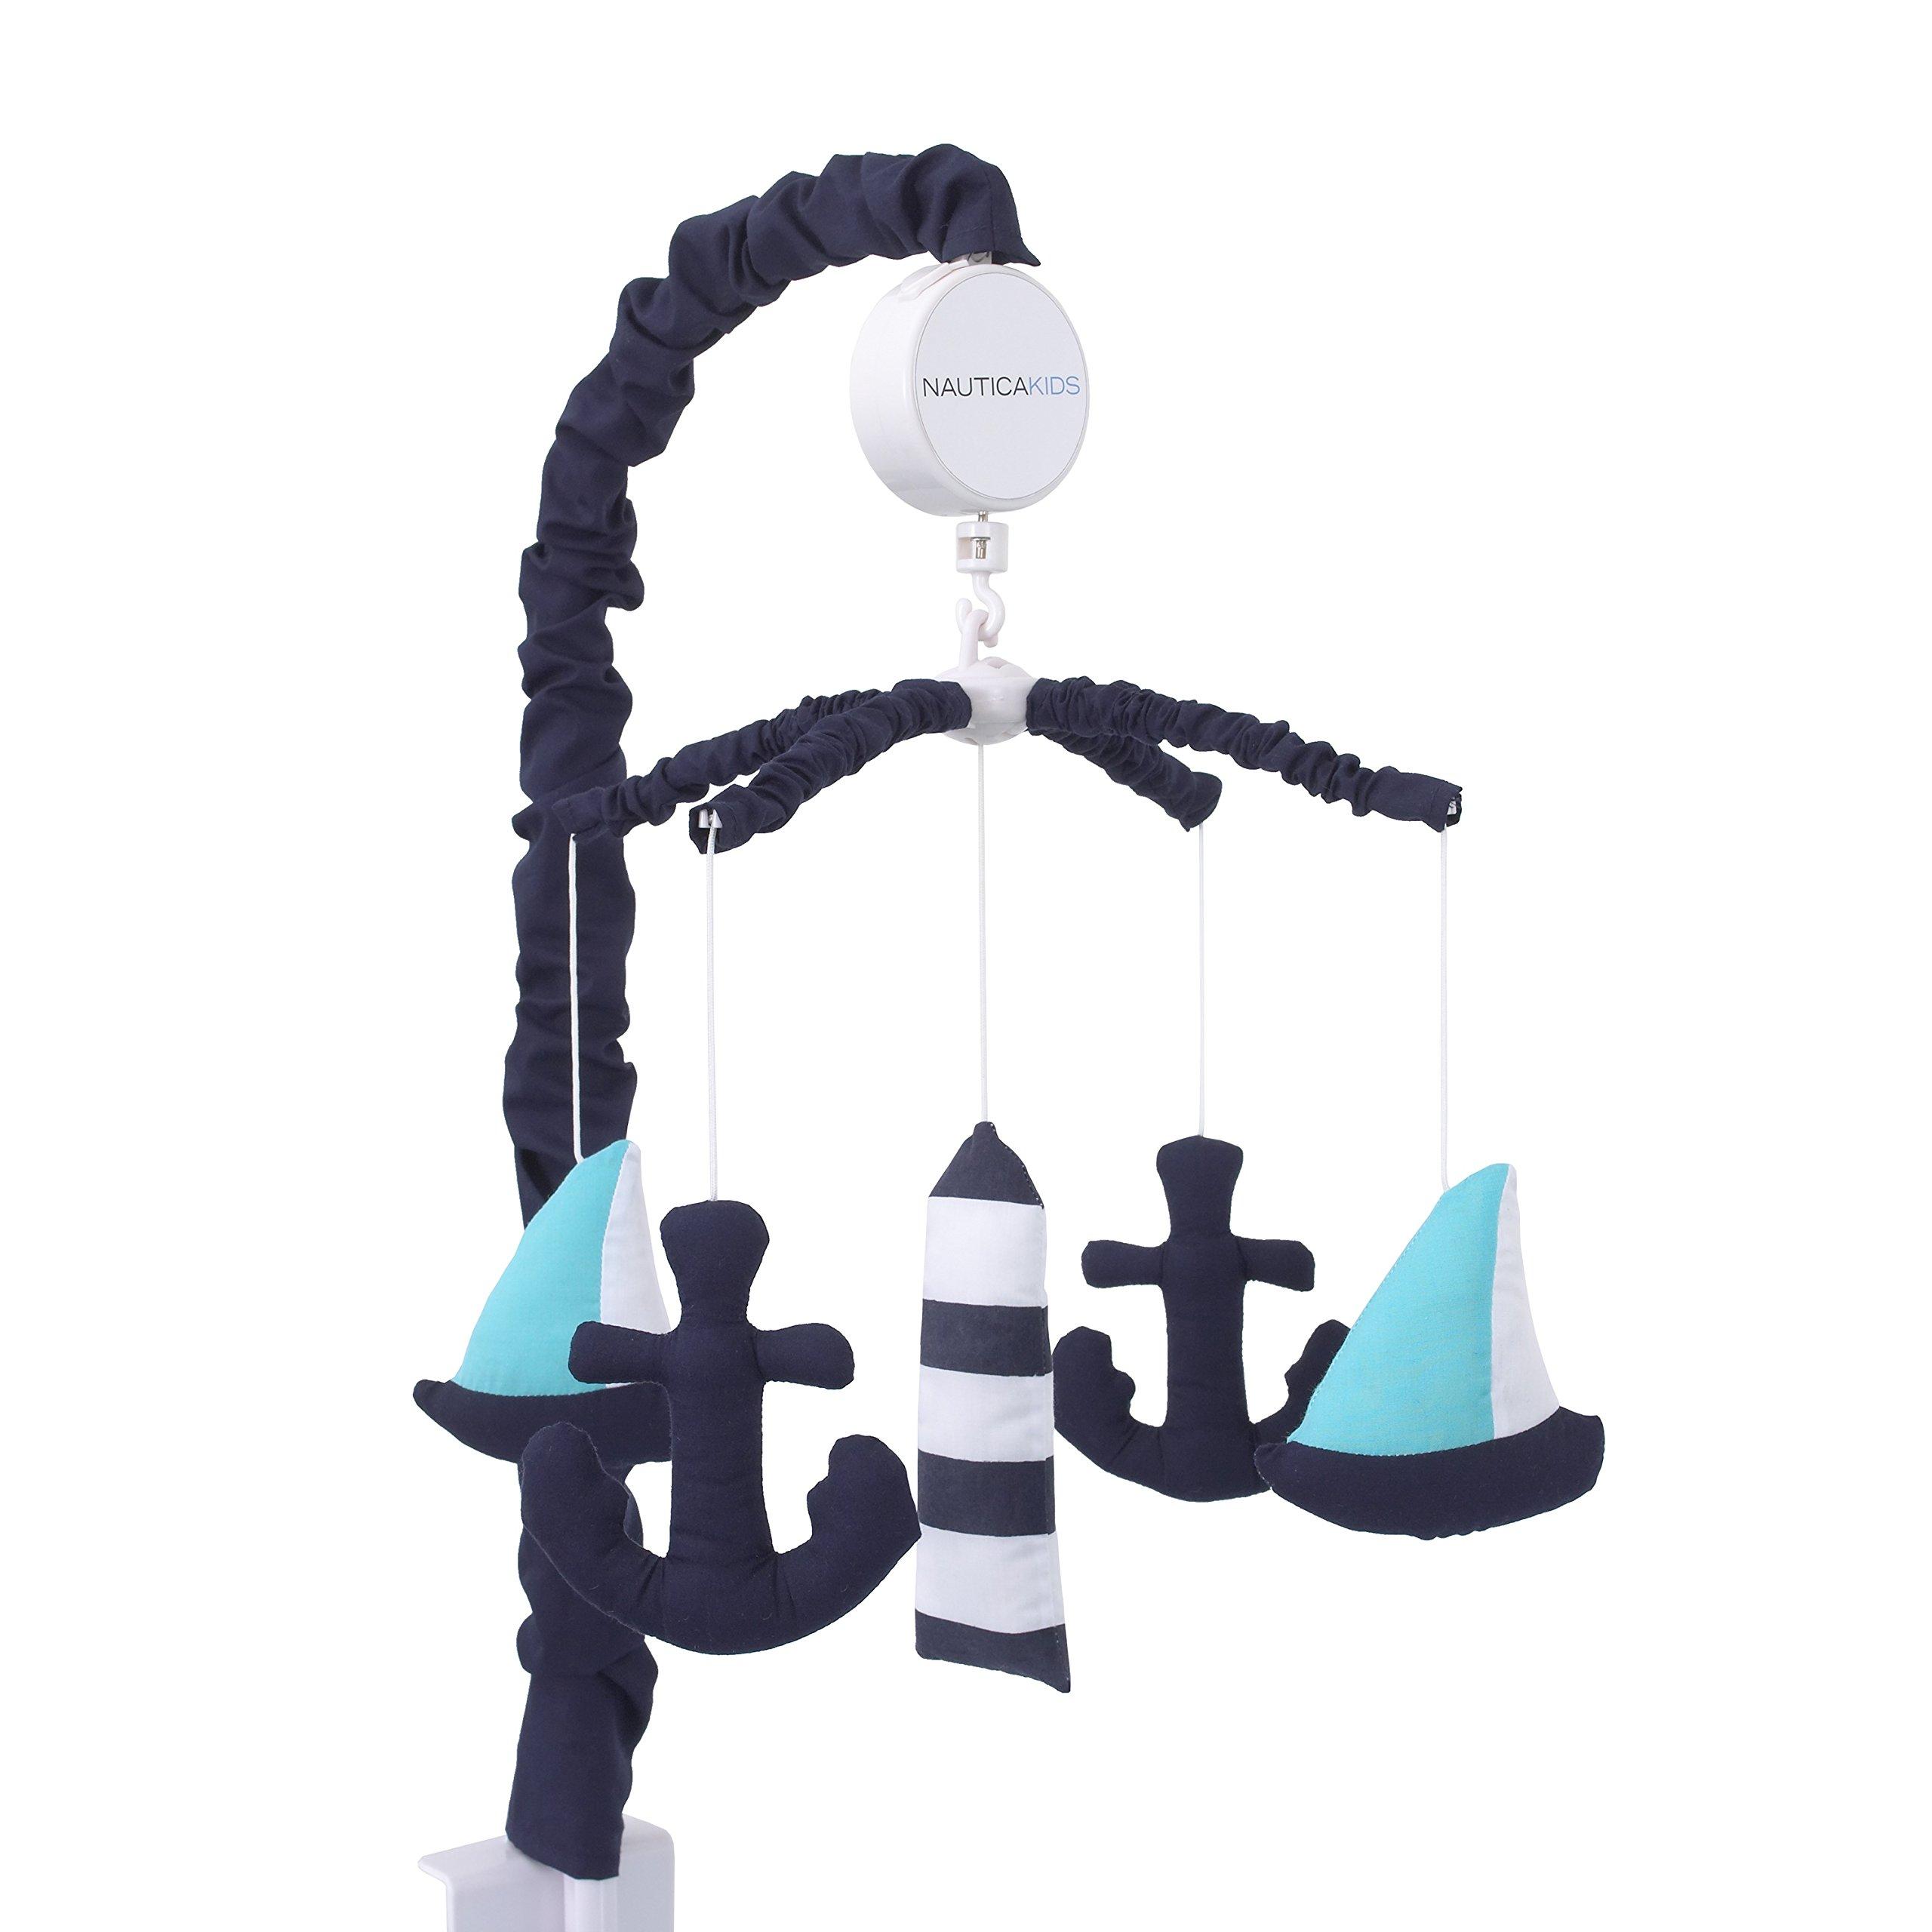 Nautica Kids Set Sail Nautical/Anchor Crib Nursery Musical Mobile, Navy, Aqua, White